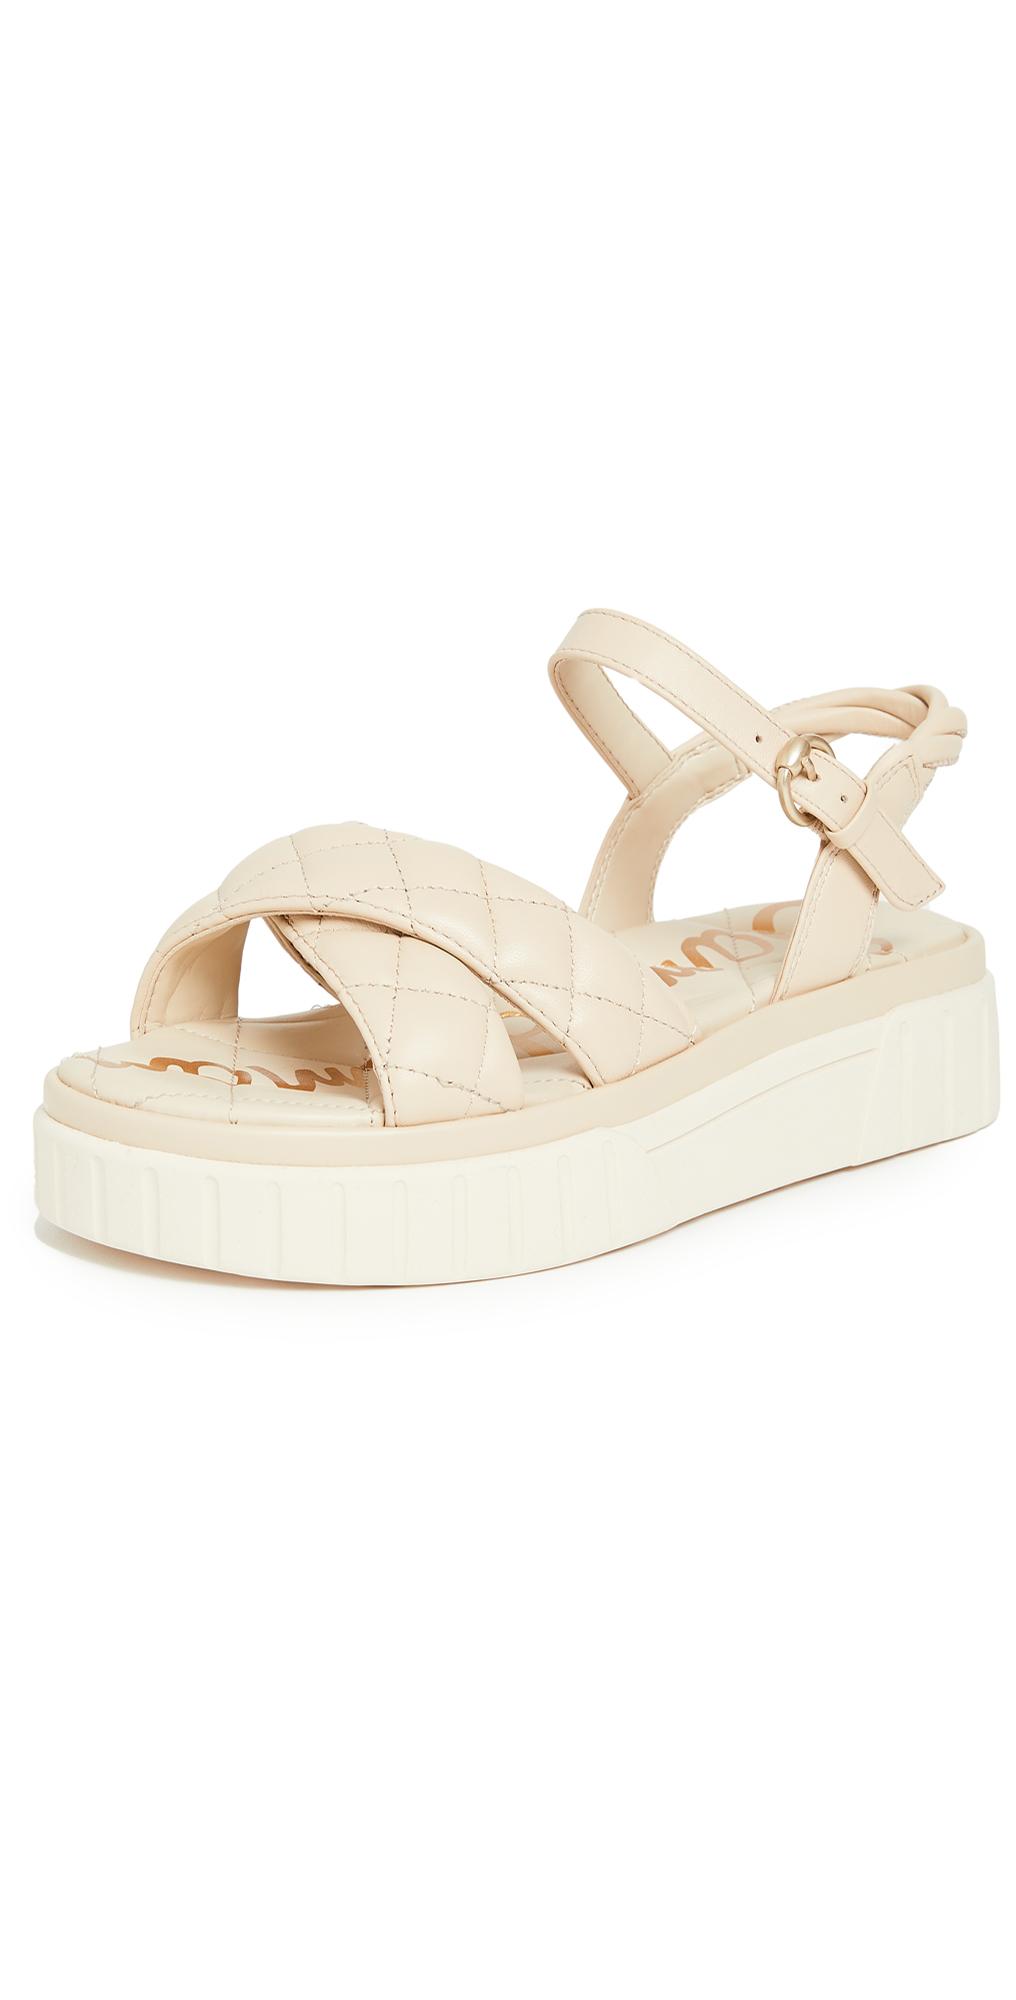 Sam Edelman Gavril Platform Sandals